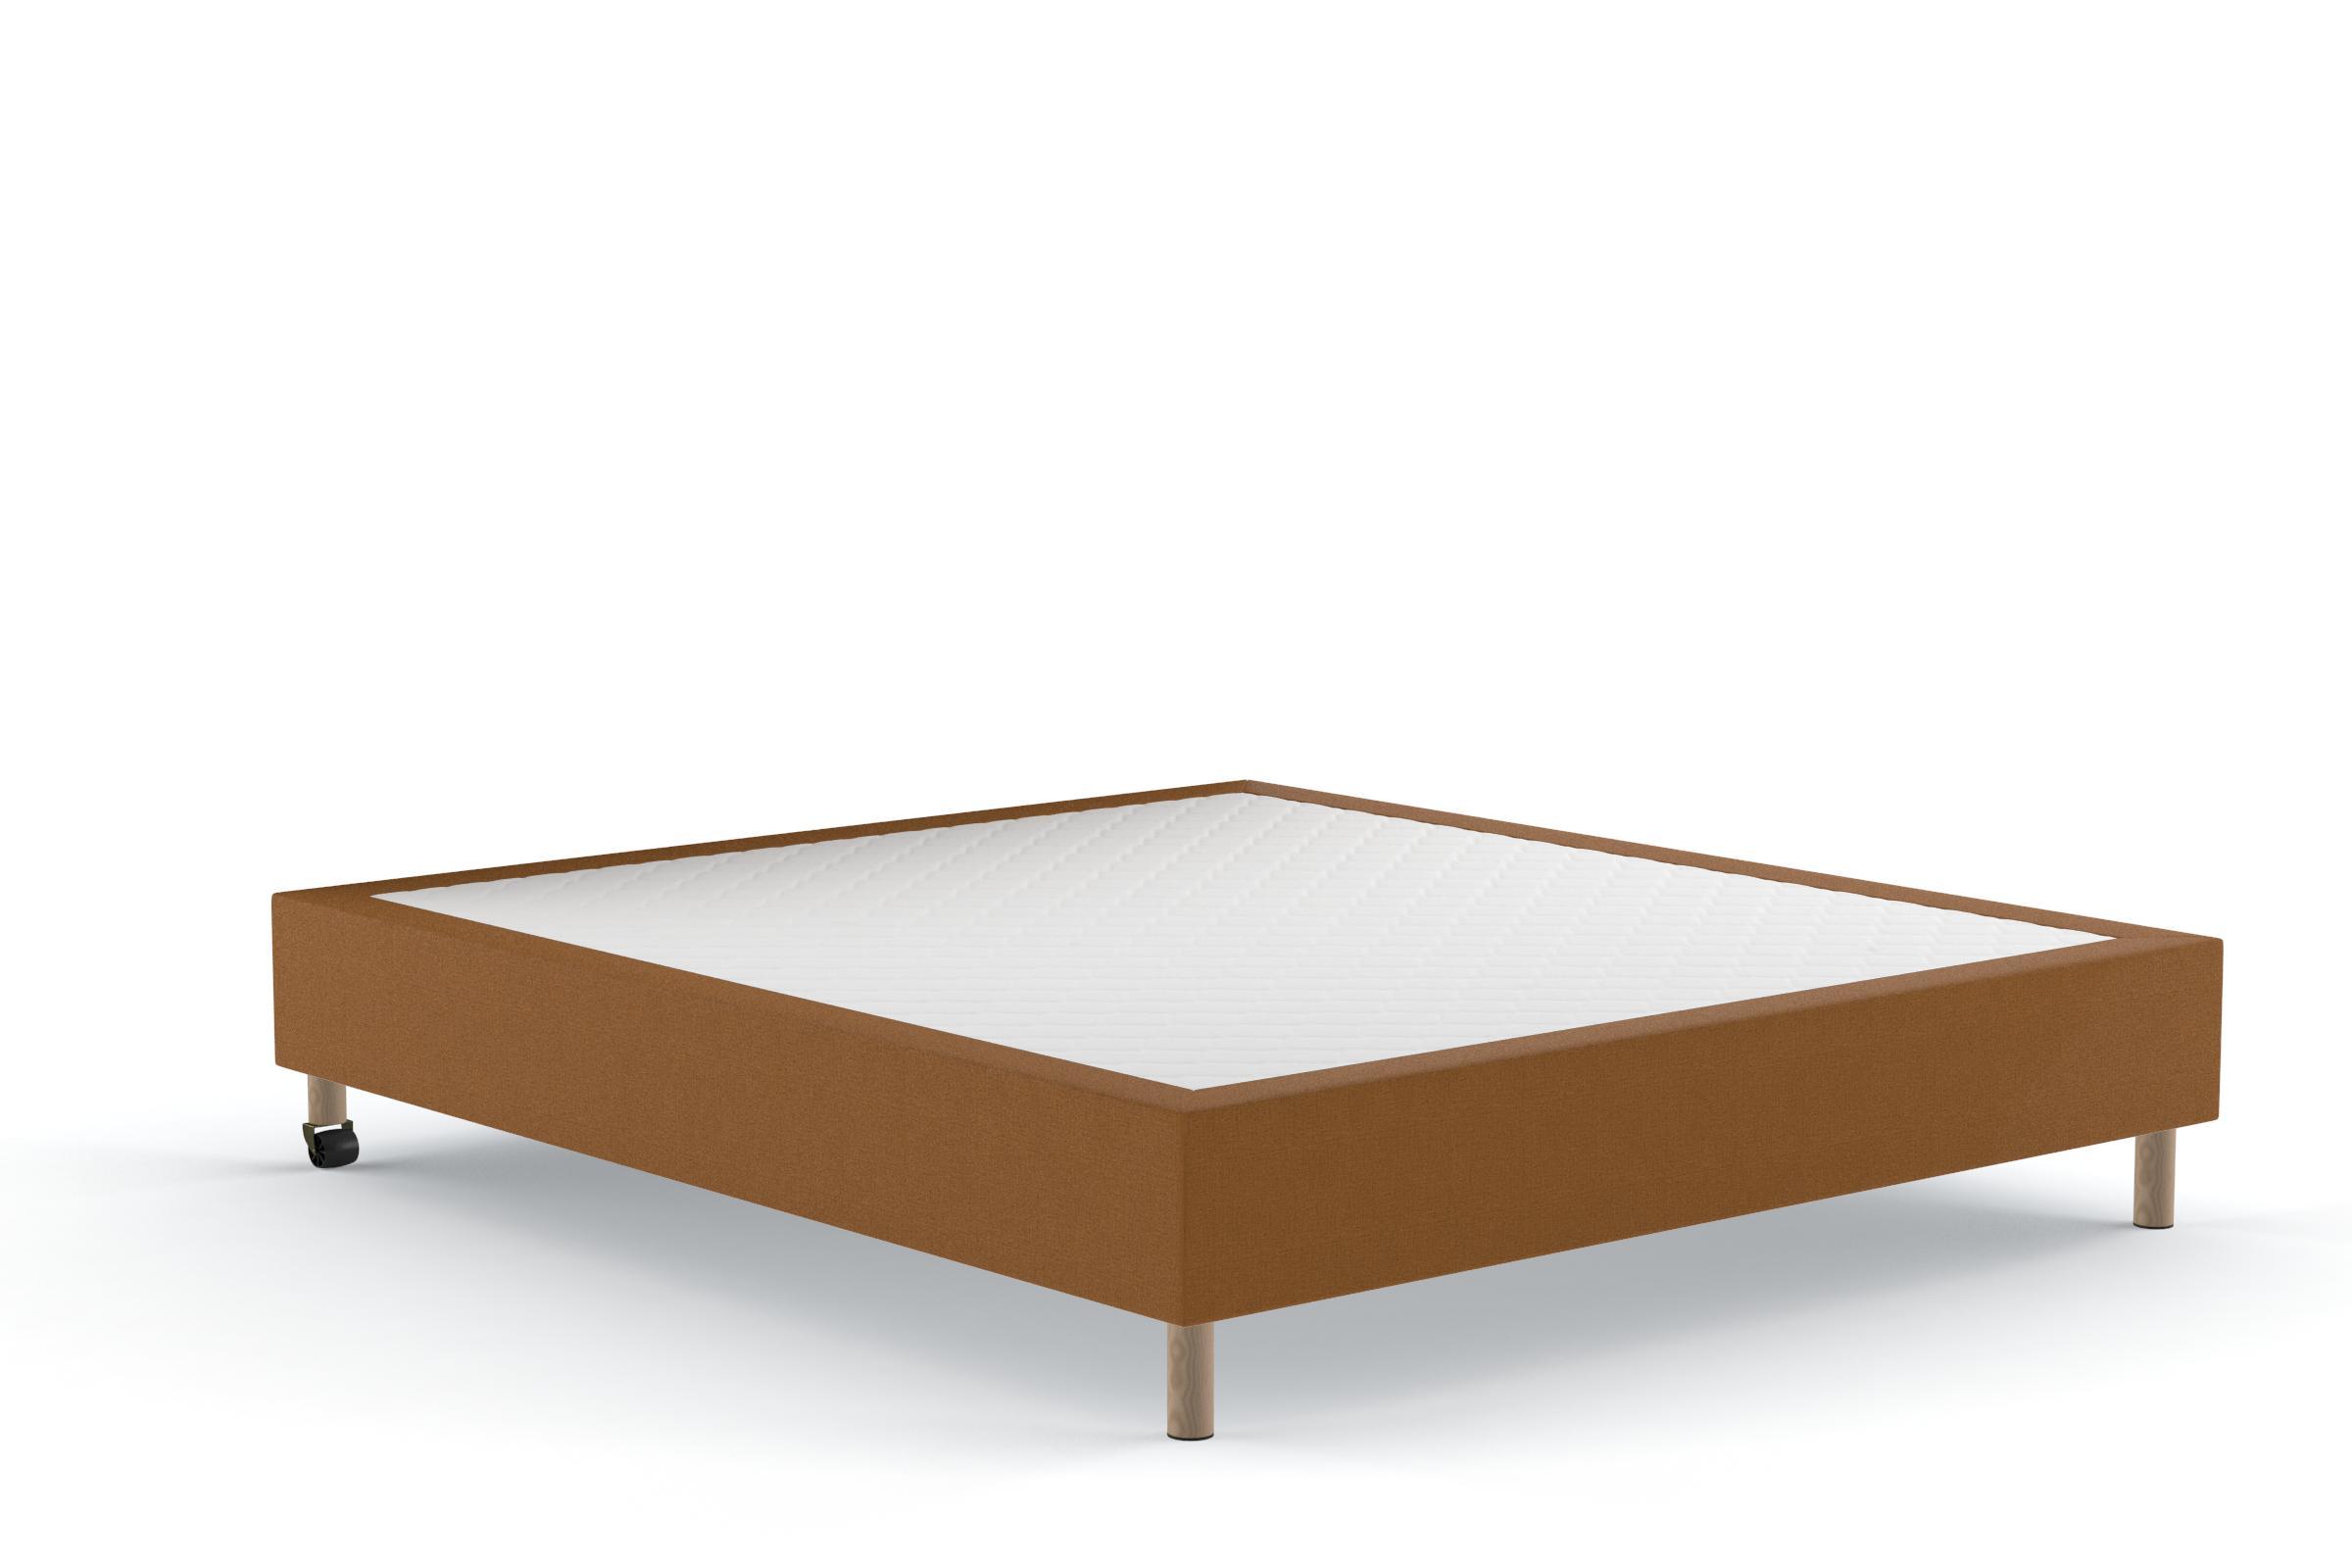 Boxspringbett aufbauanleitung  SAVOY VARIO Boxspringbett | FBF bed&more